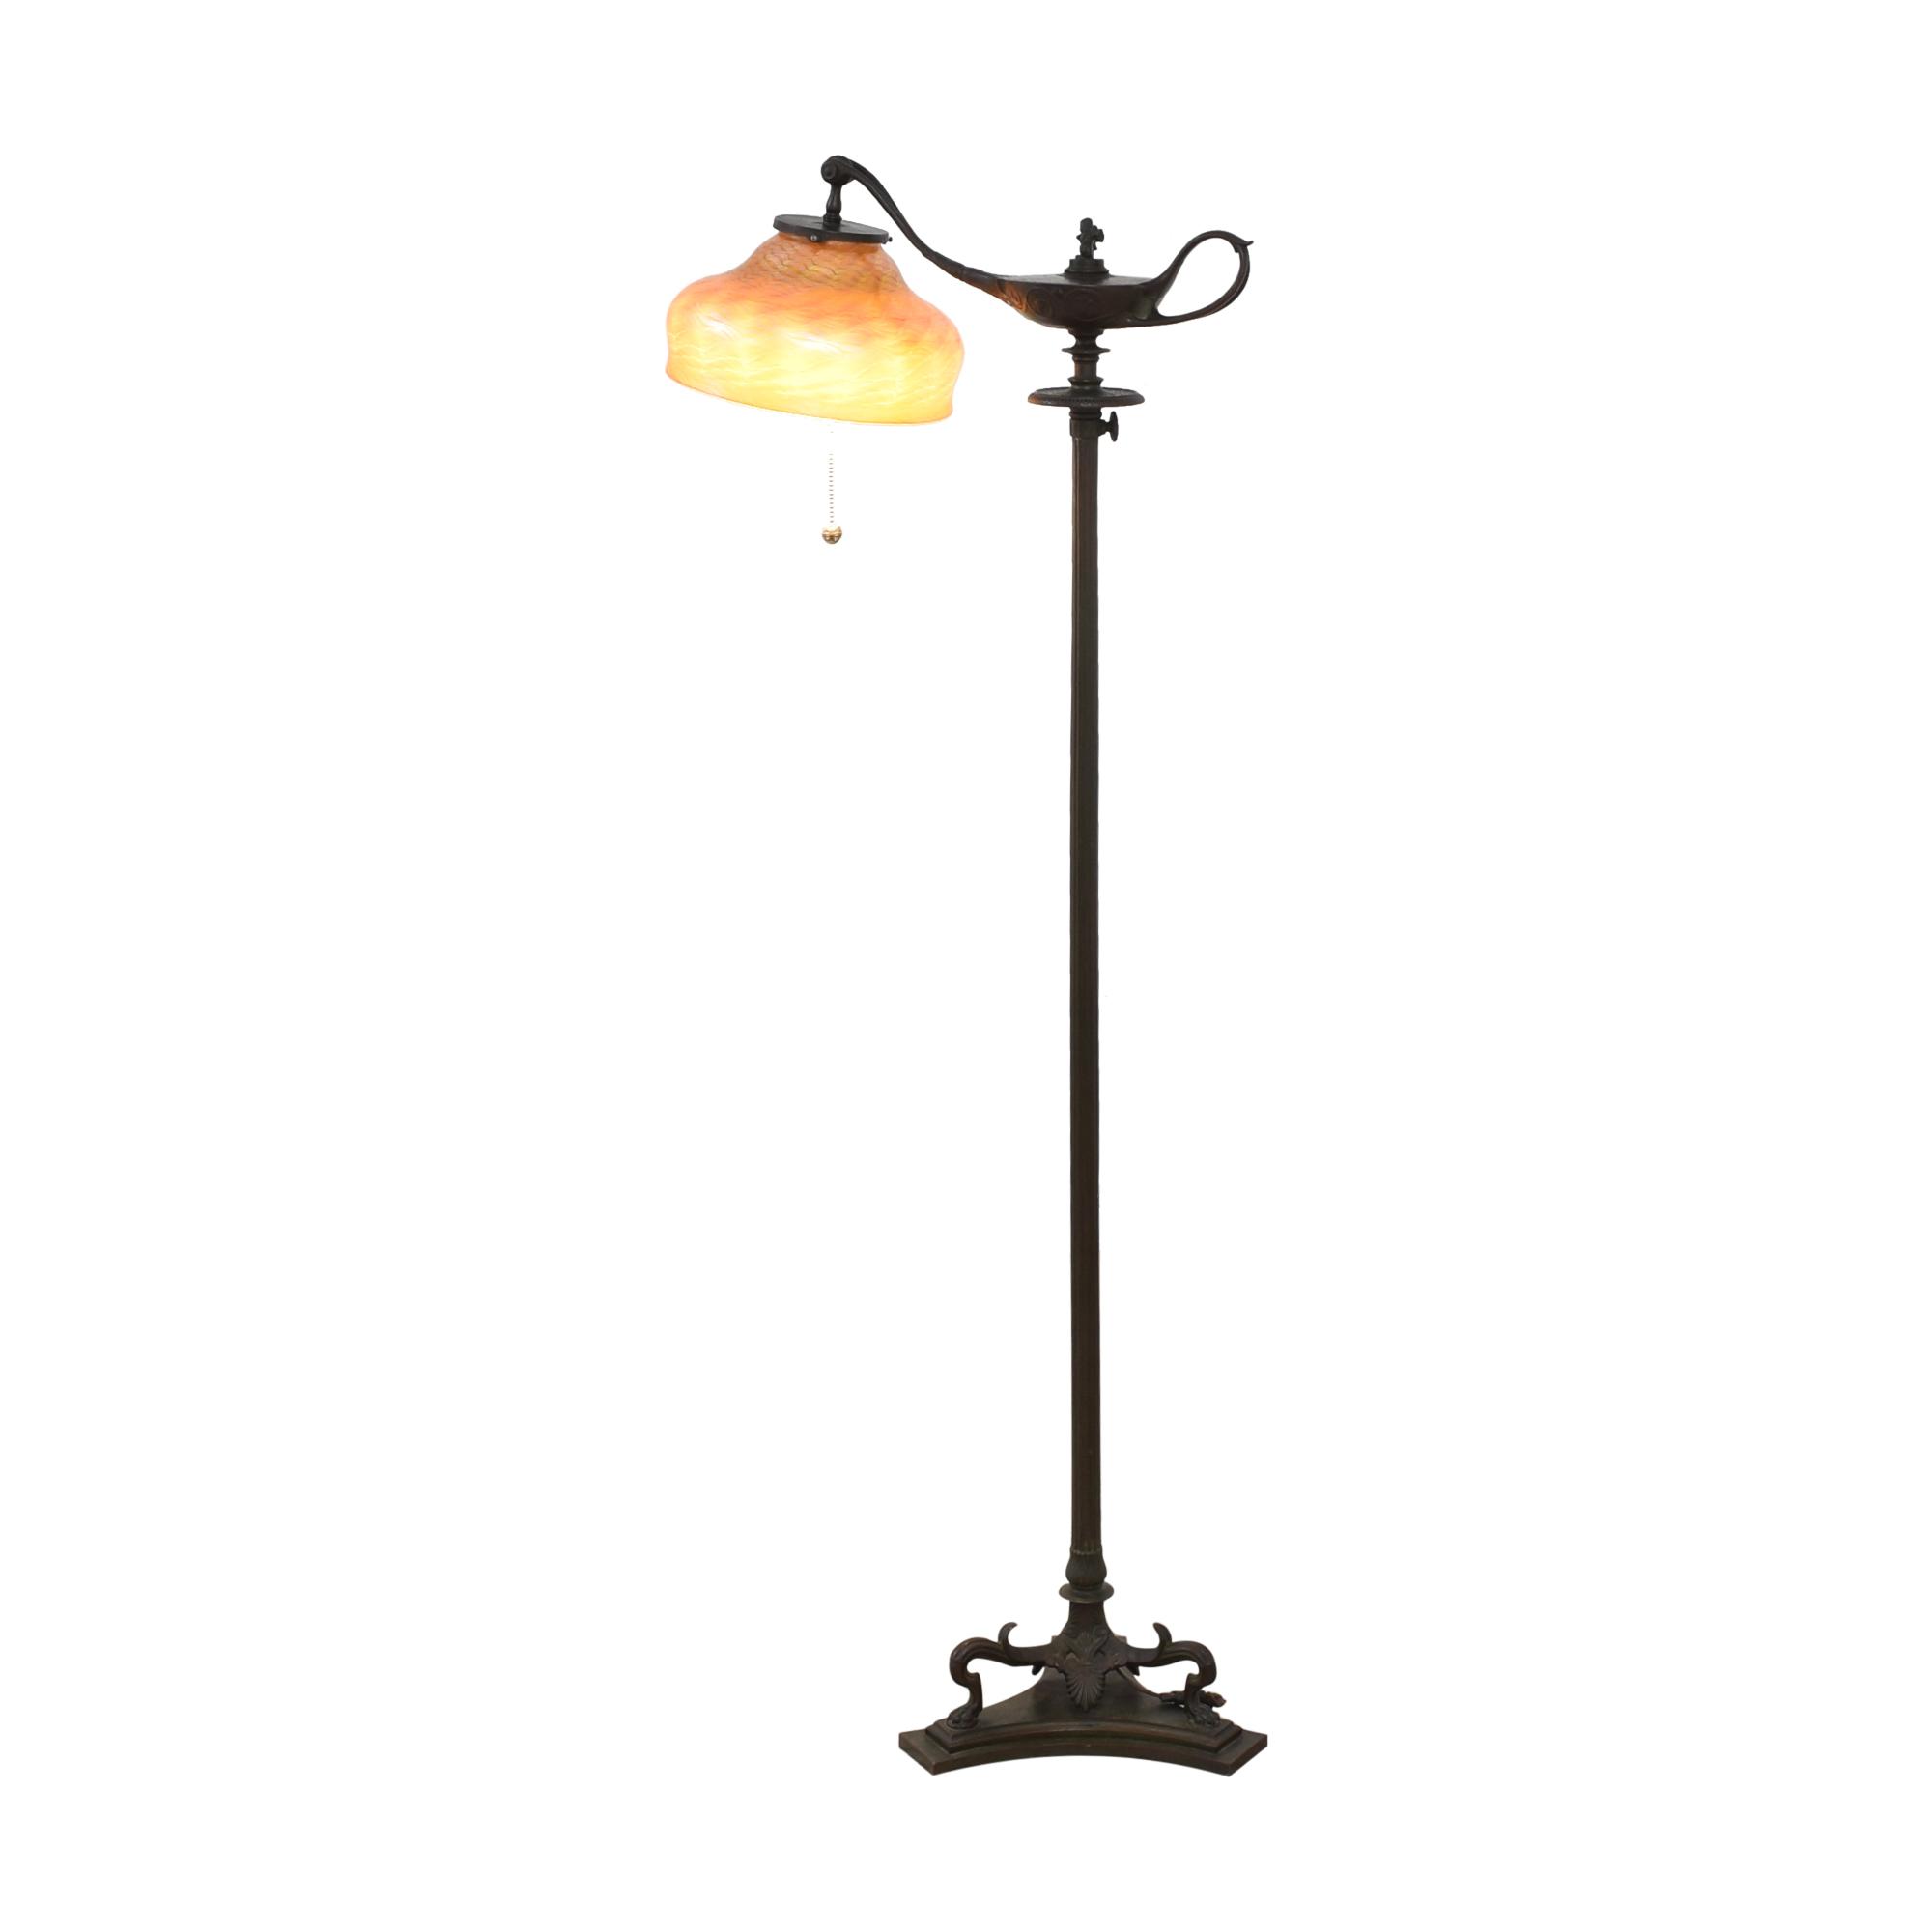 buy Tiffany Studios Gilt Bronze and Favrile Glass Aladdin Floor Lamp Tiffany Studios New York Lamps